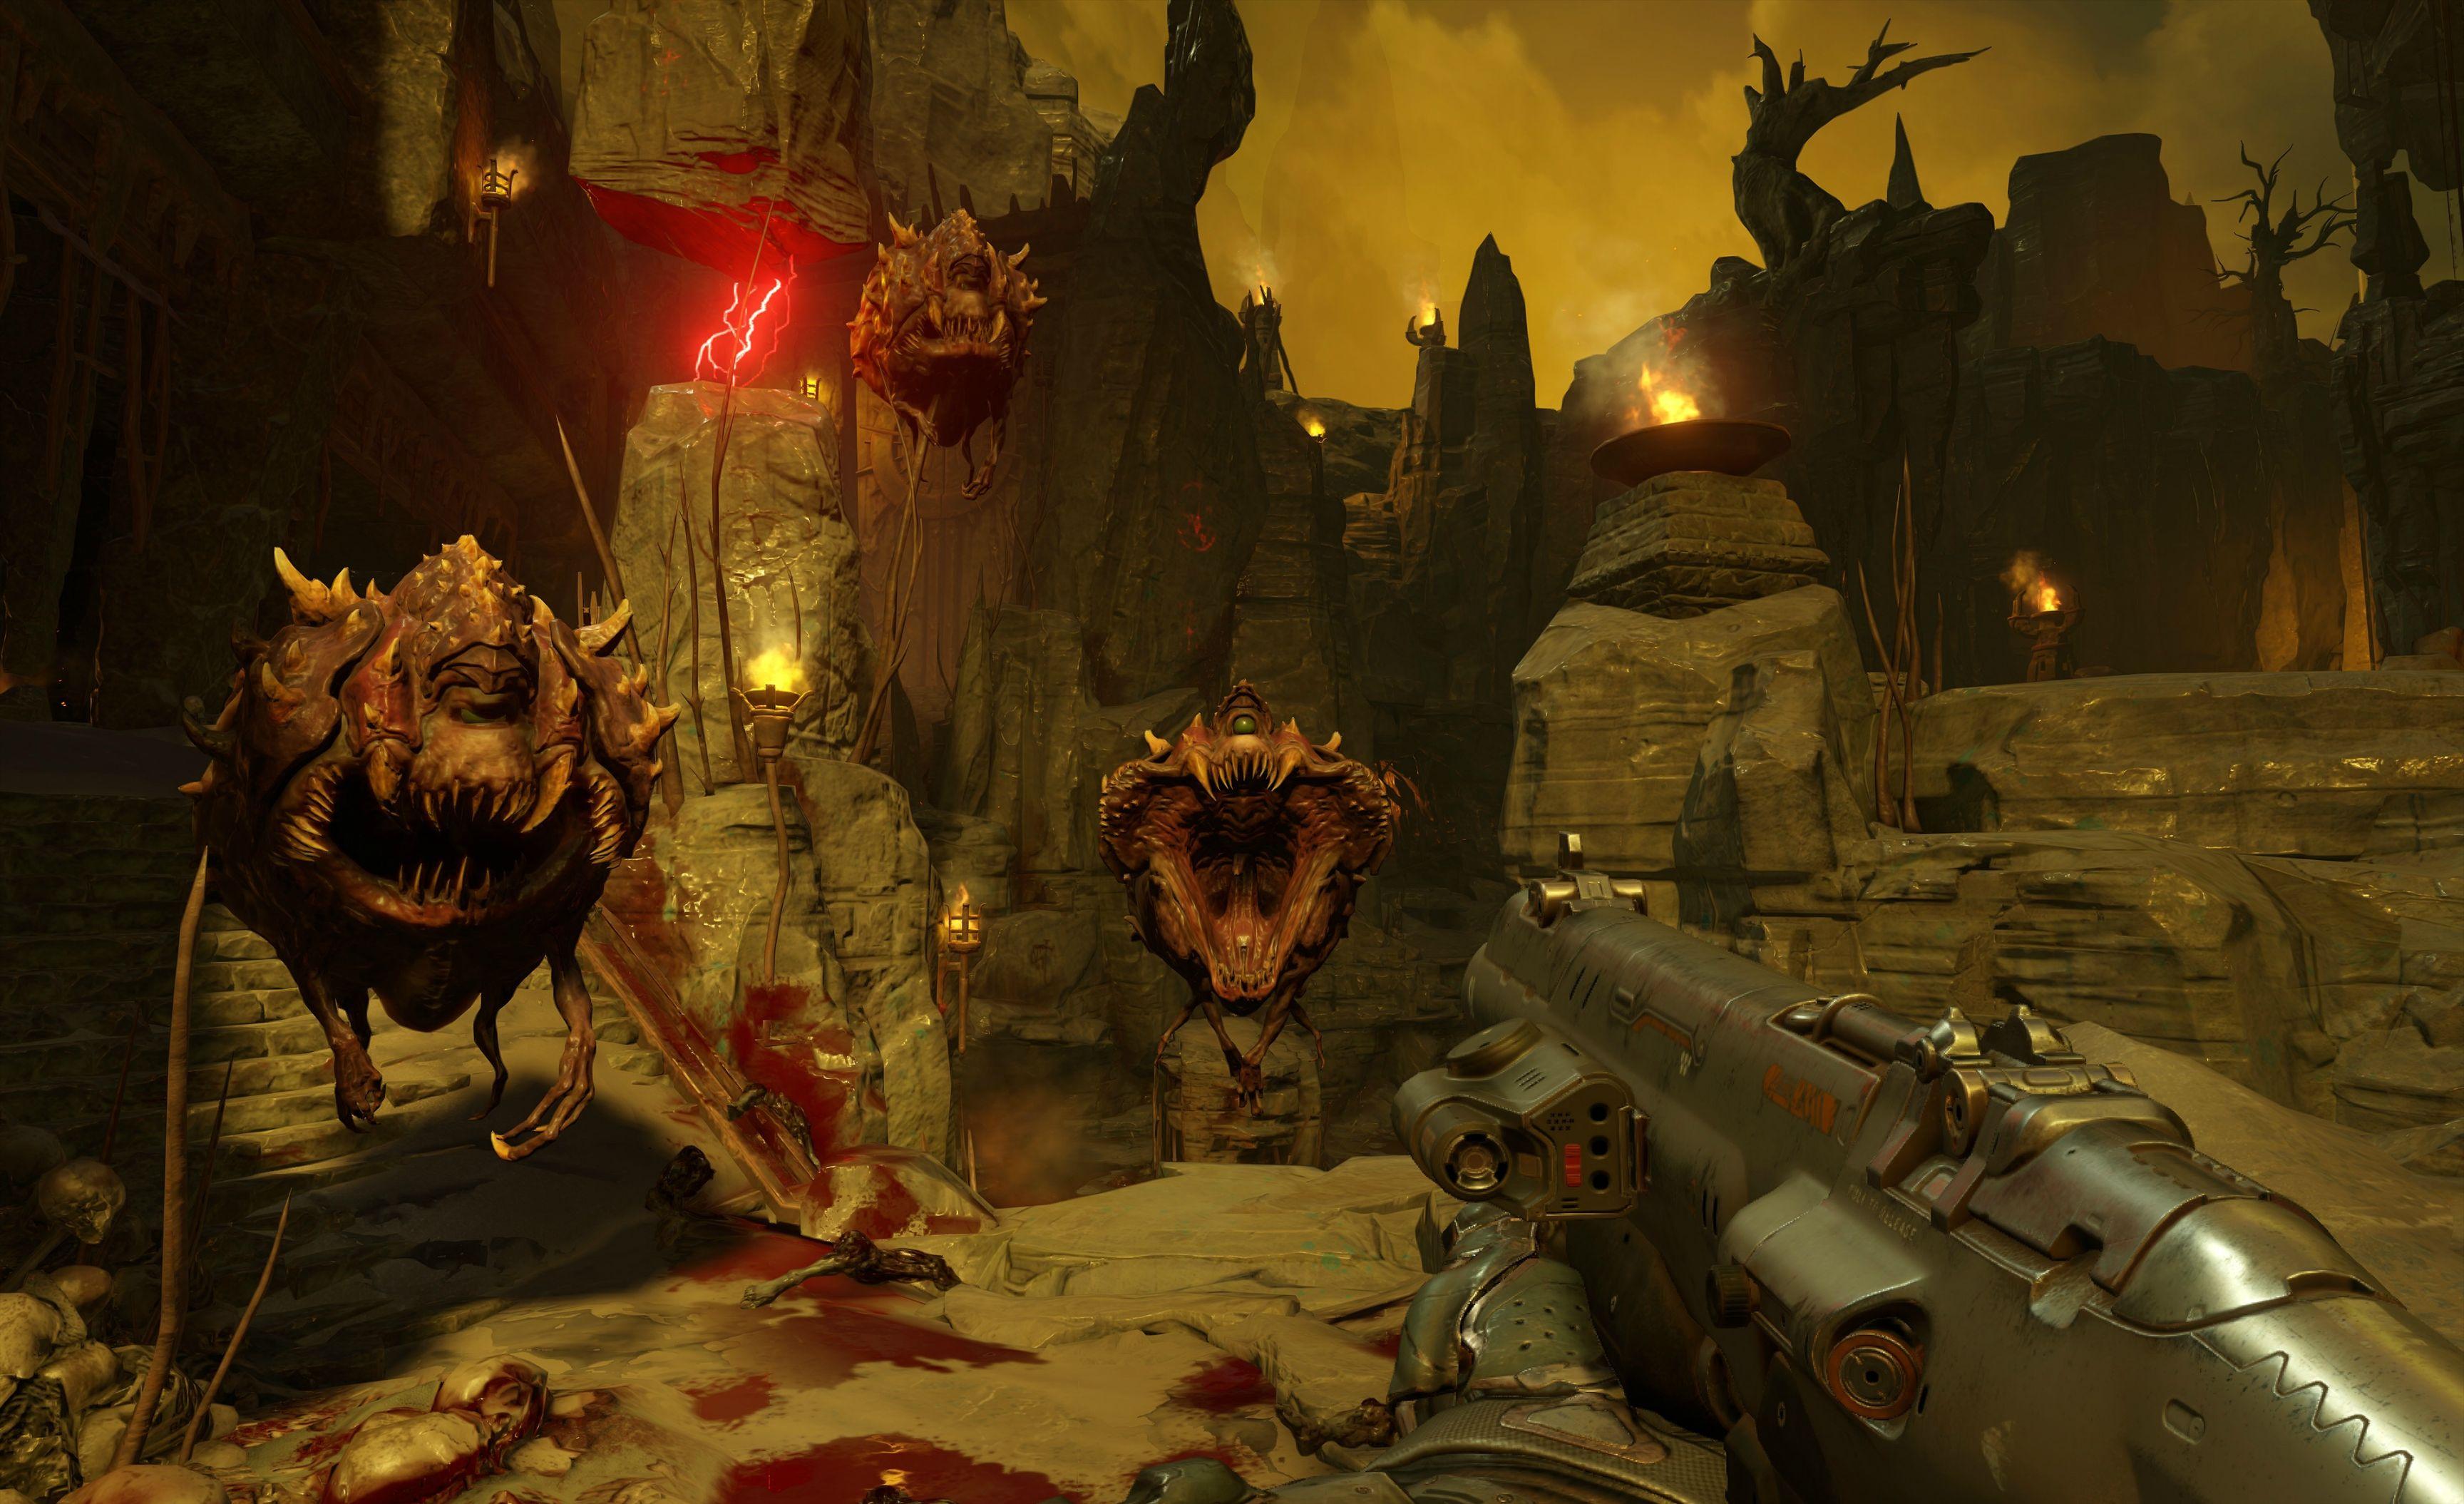 Nový Doom na jaře 2016 s brokovnicí, motorovkou a brutalitou 110120